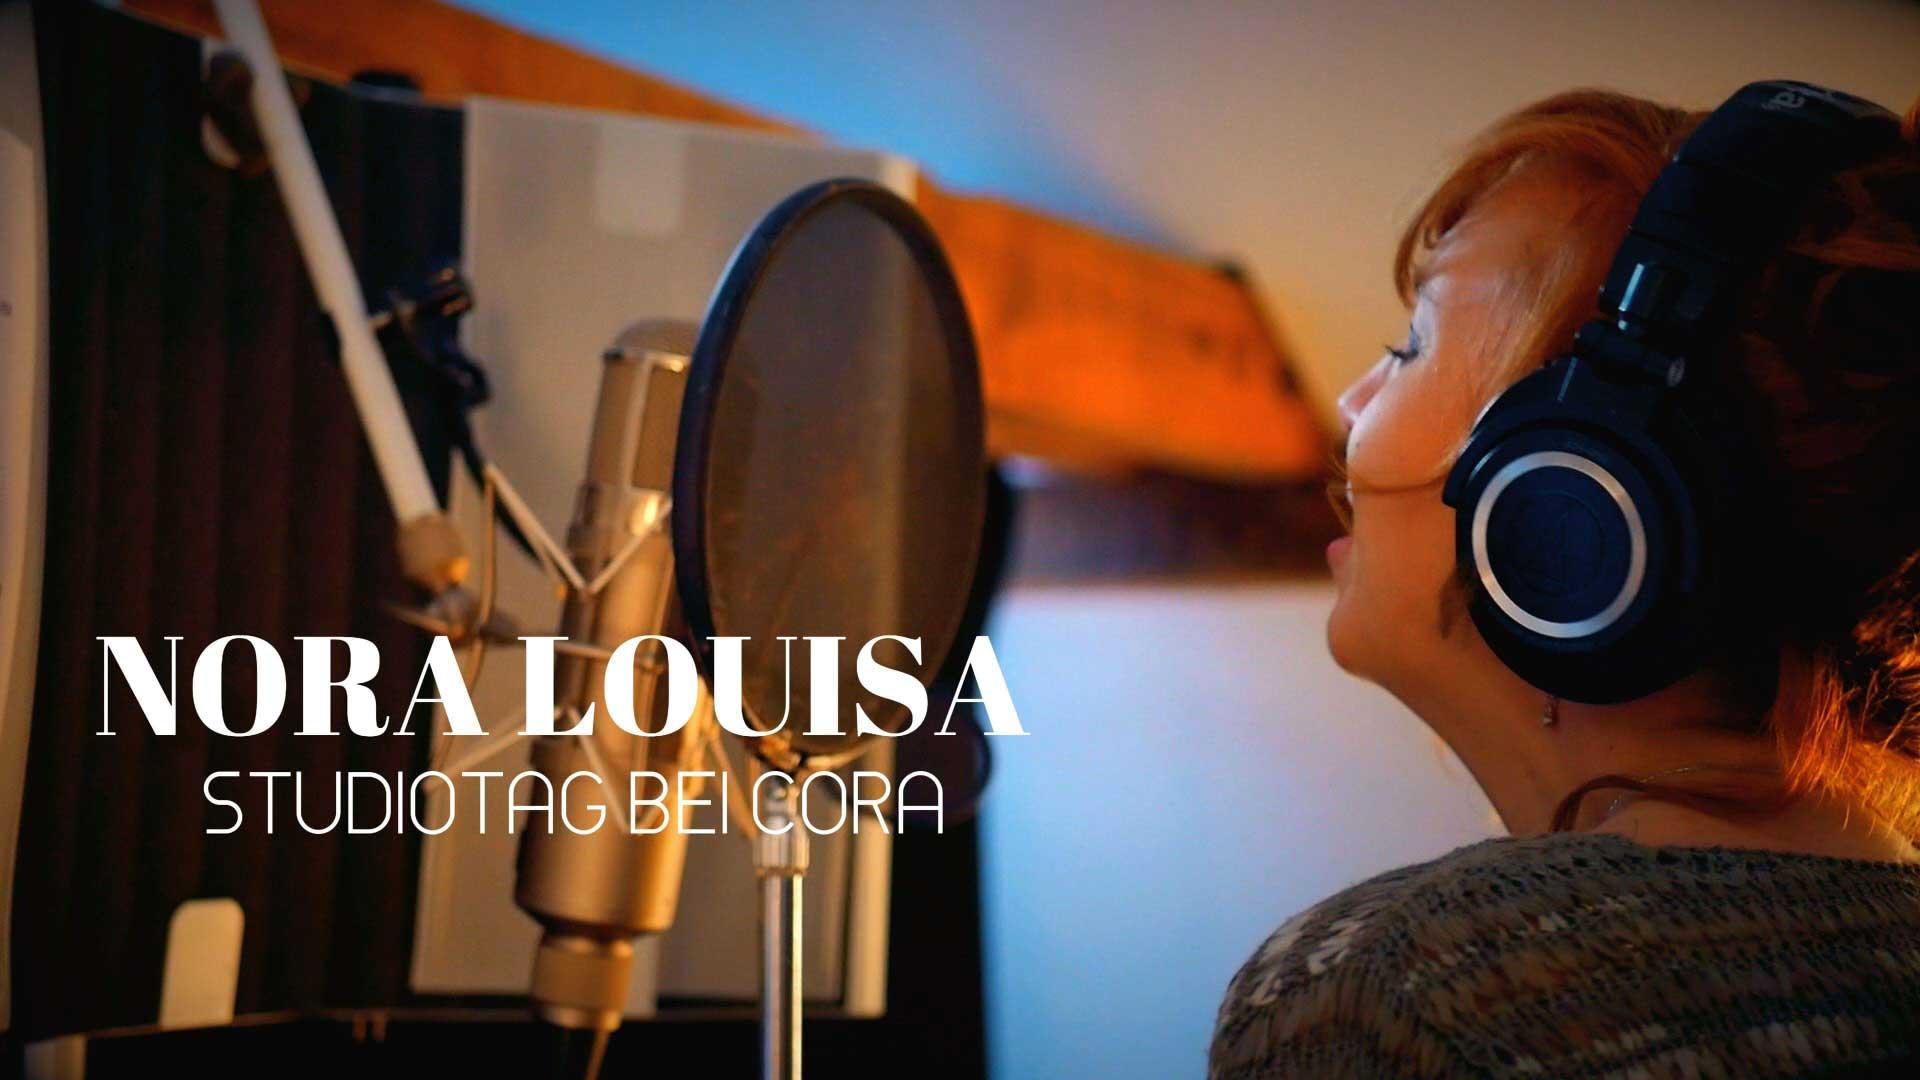 Nora-Louisa---Studiotage-bei-Cora